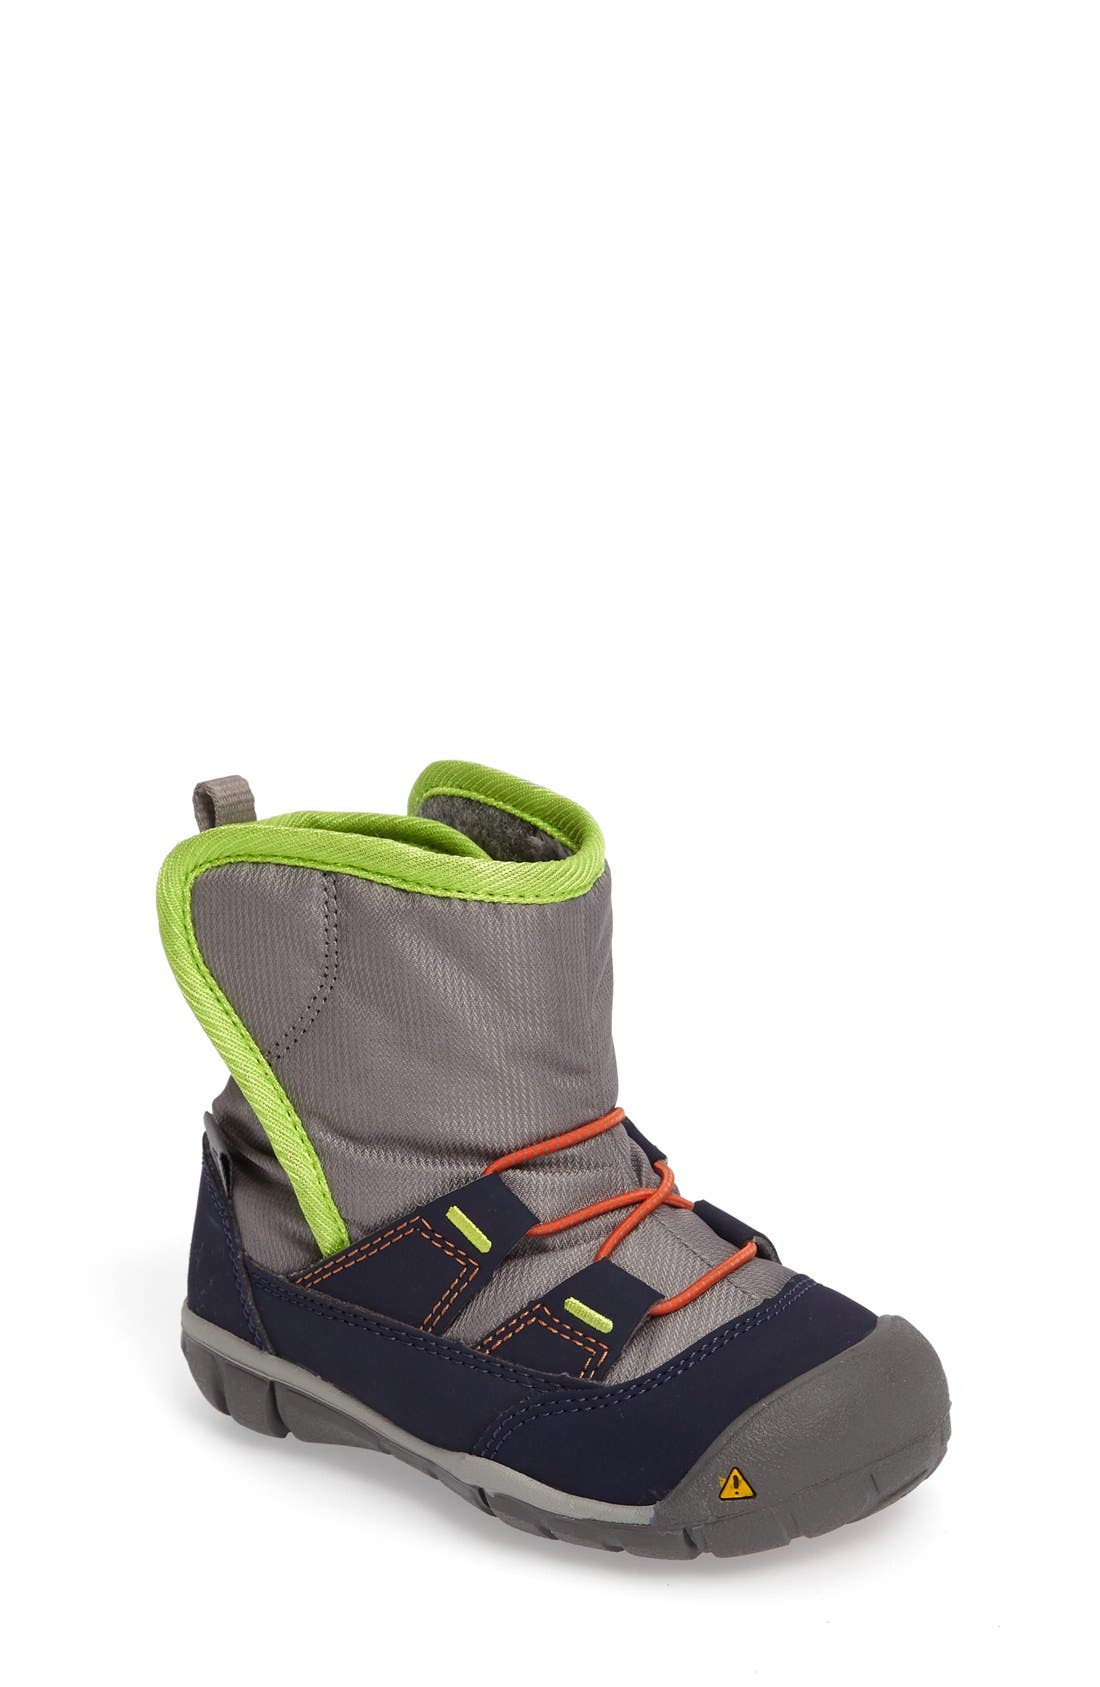 Main Image - Keen Peek-A-Boot Fleece Lined Boot (Baby & Walker)